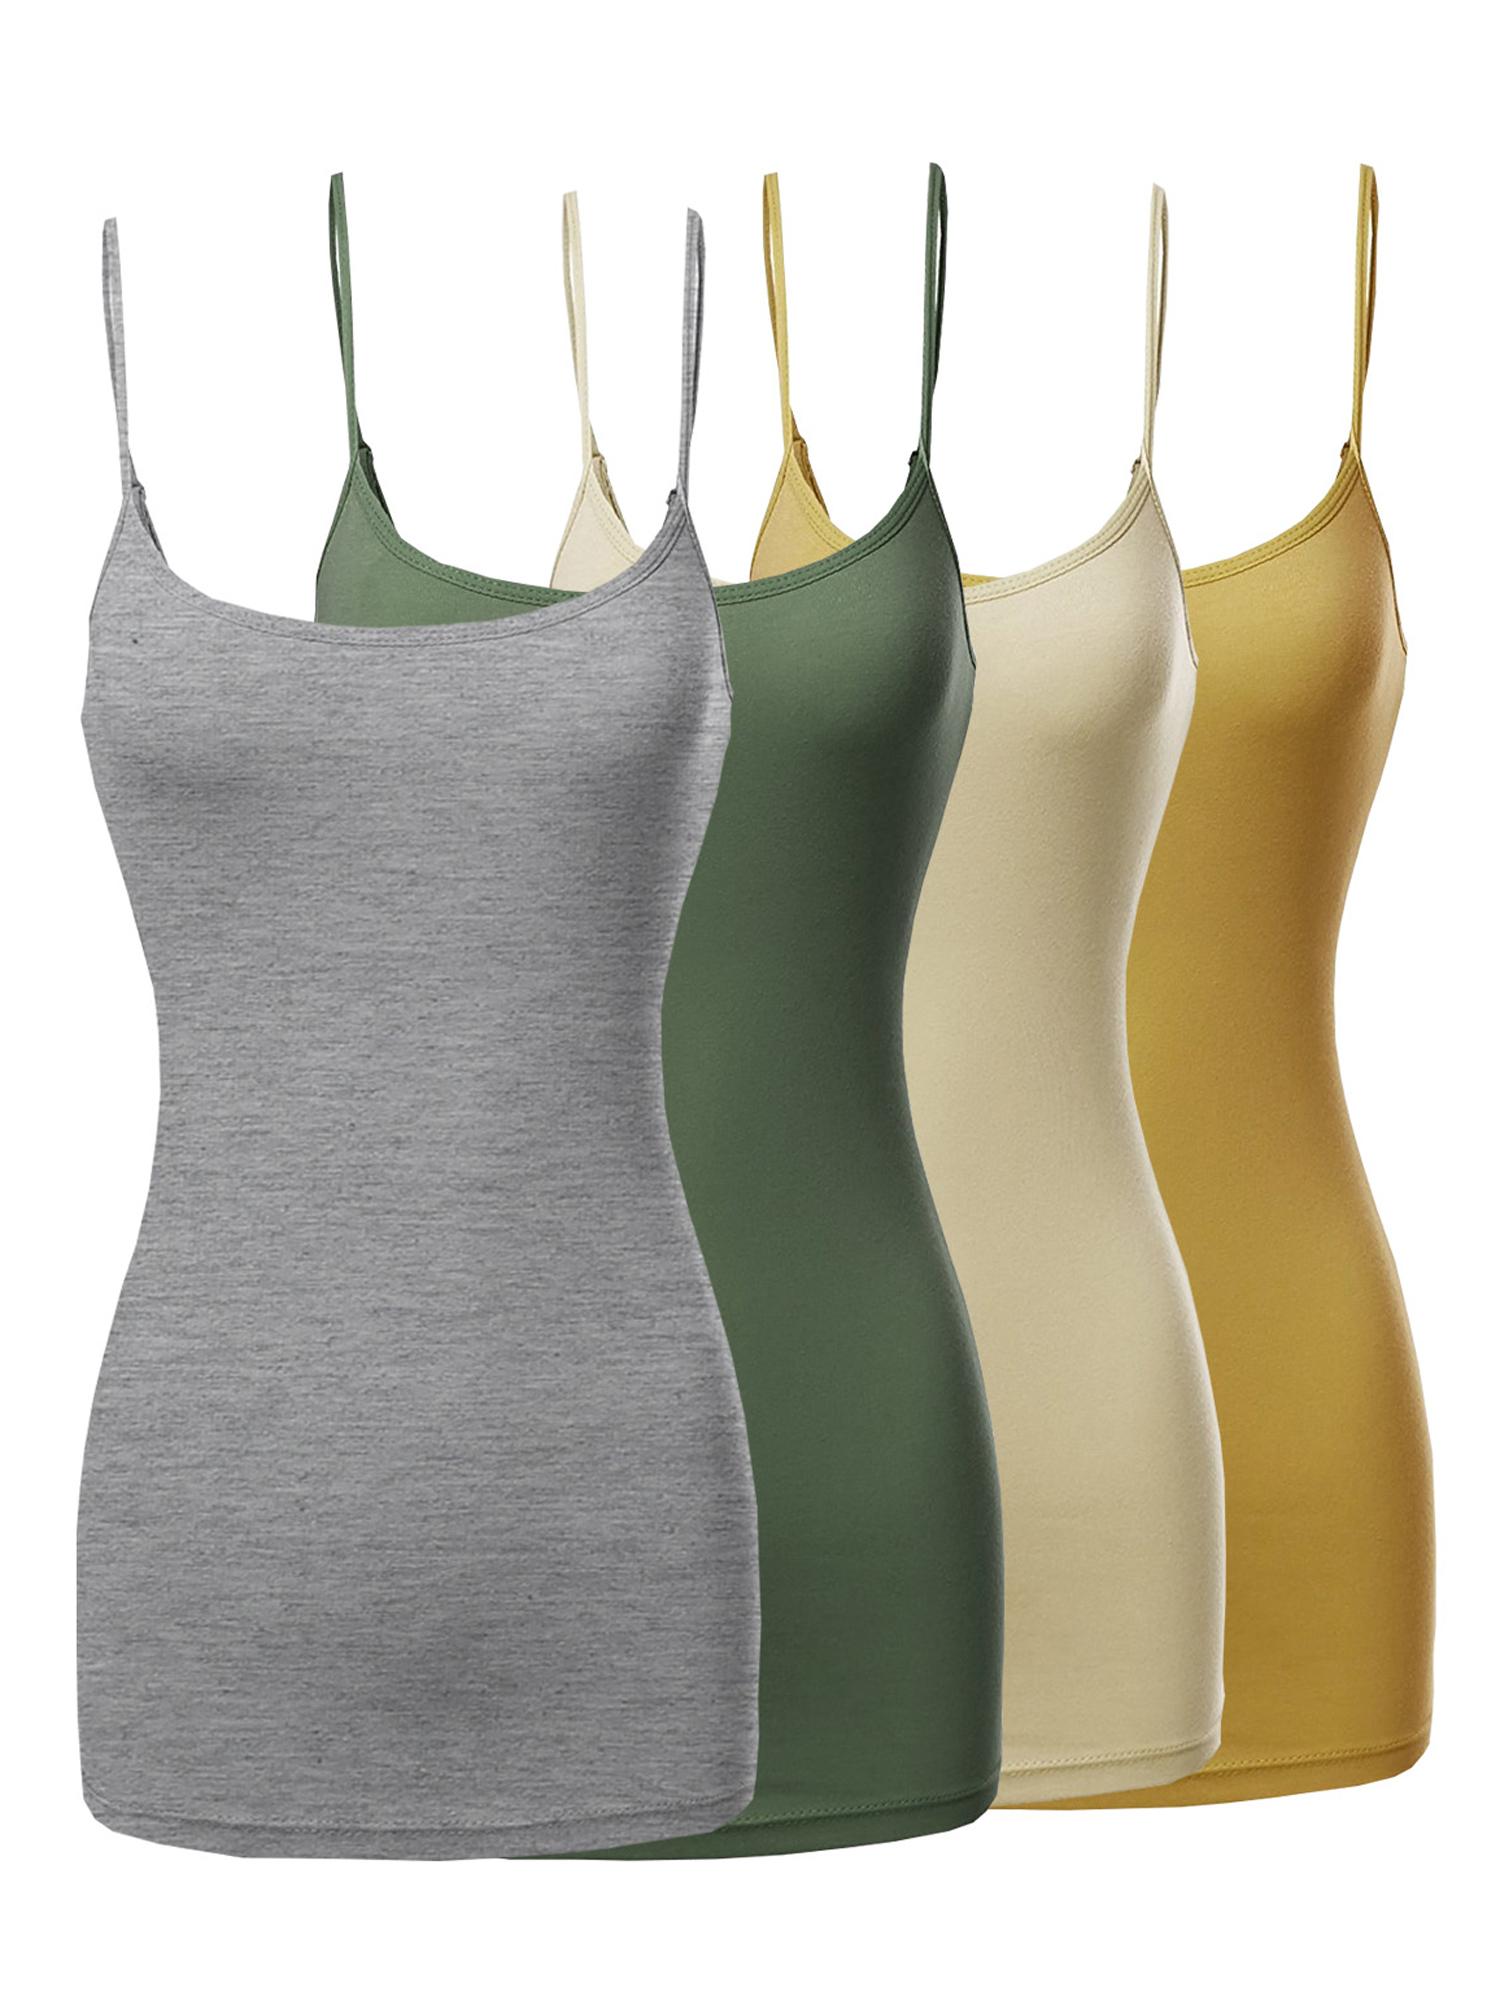 Women-amp-Juniors-Basic-Solid-Long-Length-Adjustable-Spaghetti-Strap-Tank-Top